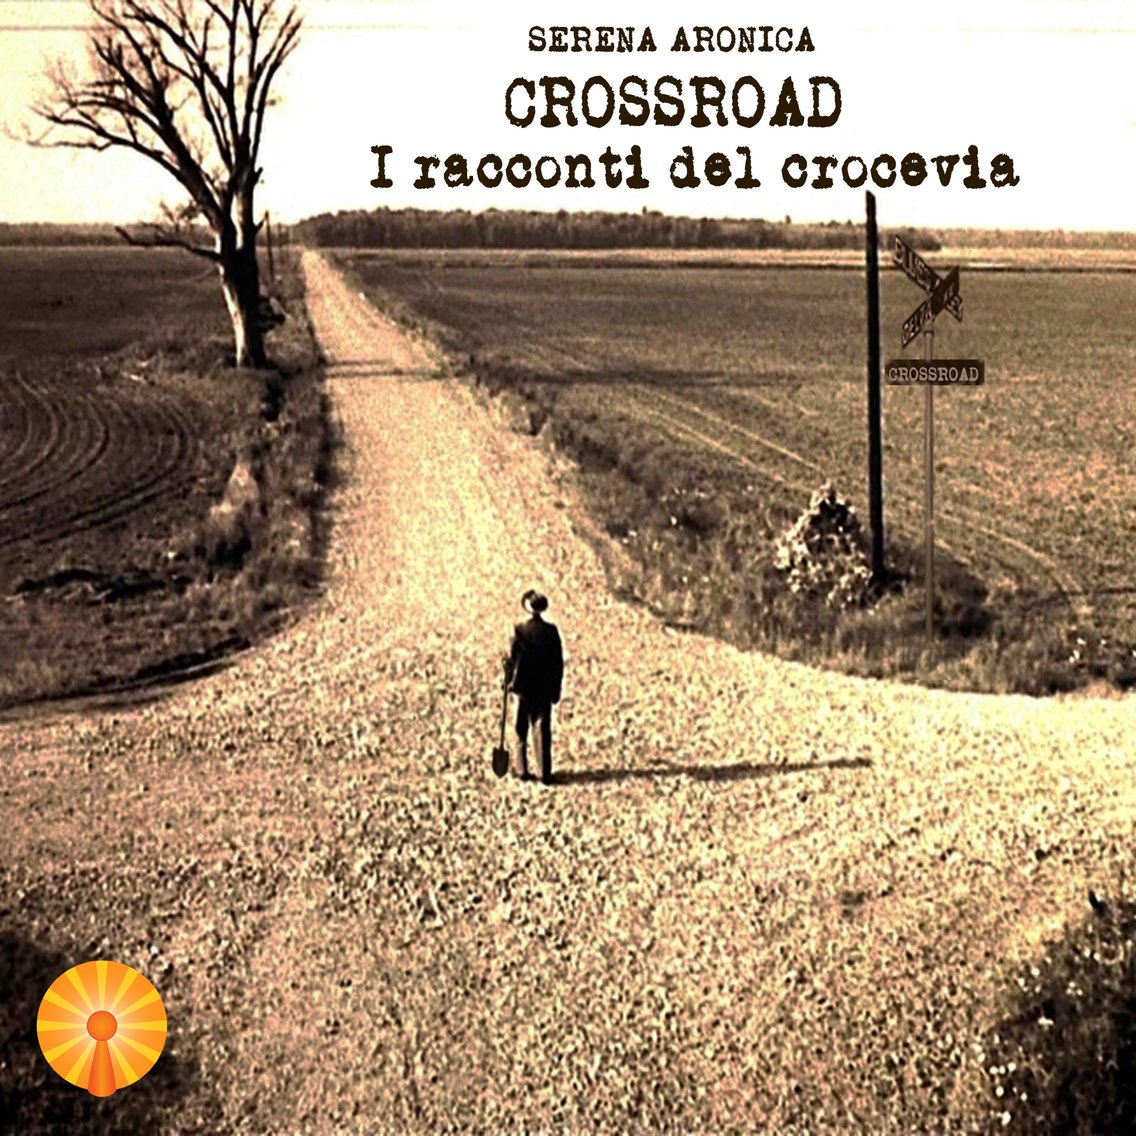 Crossroad: i racconti del crocevia - Cover Image